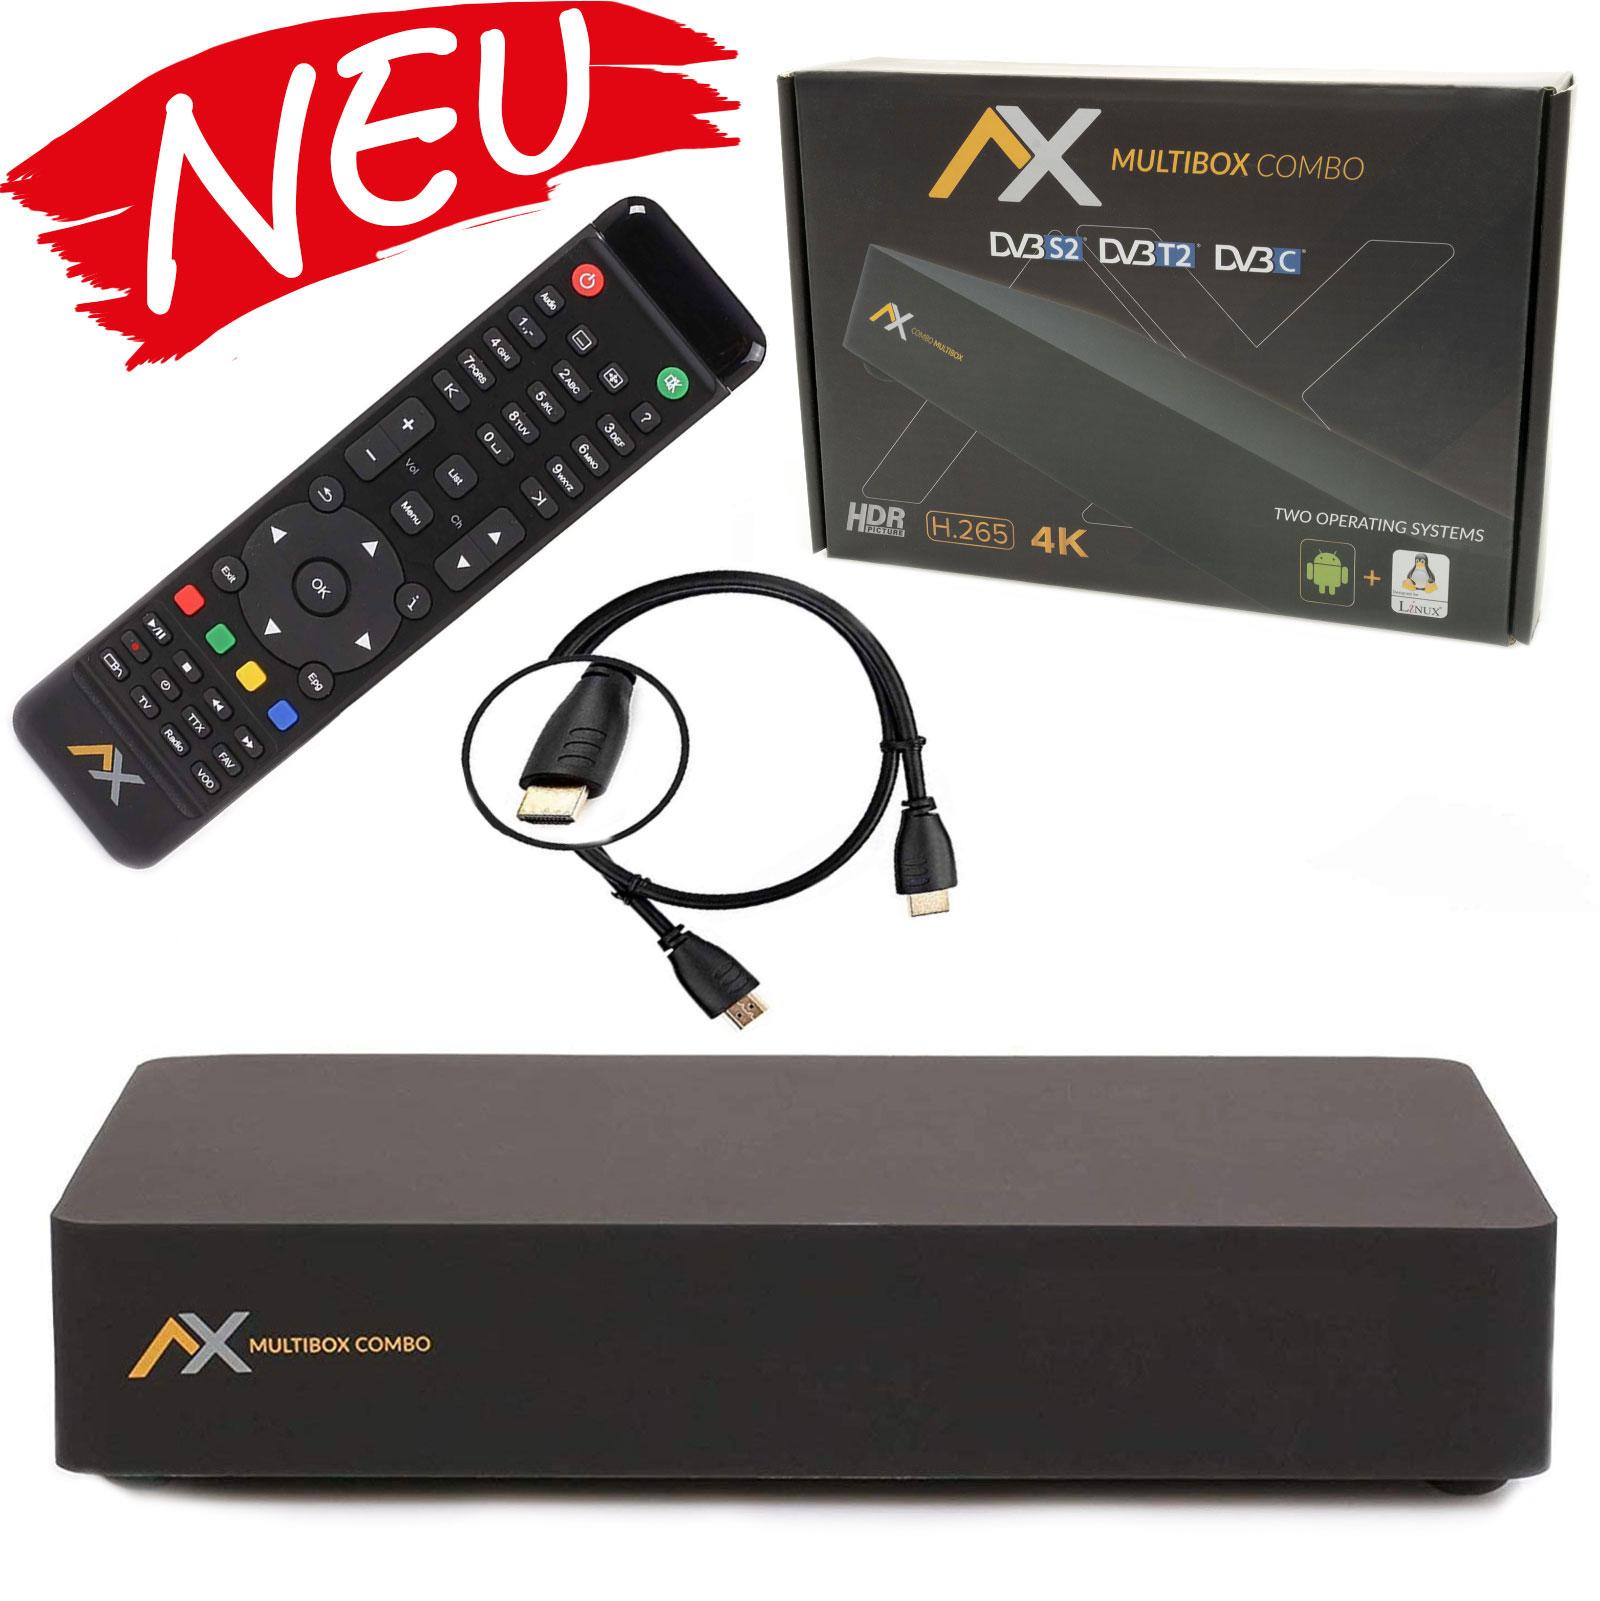 AX Multibox 4K UHD E2 Linux Combo Sat- Kabel- DVB-T2 Receiver